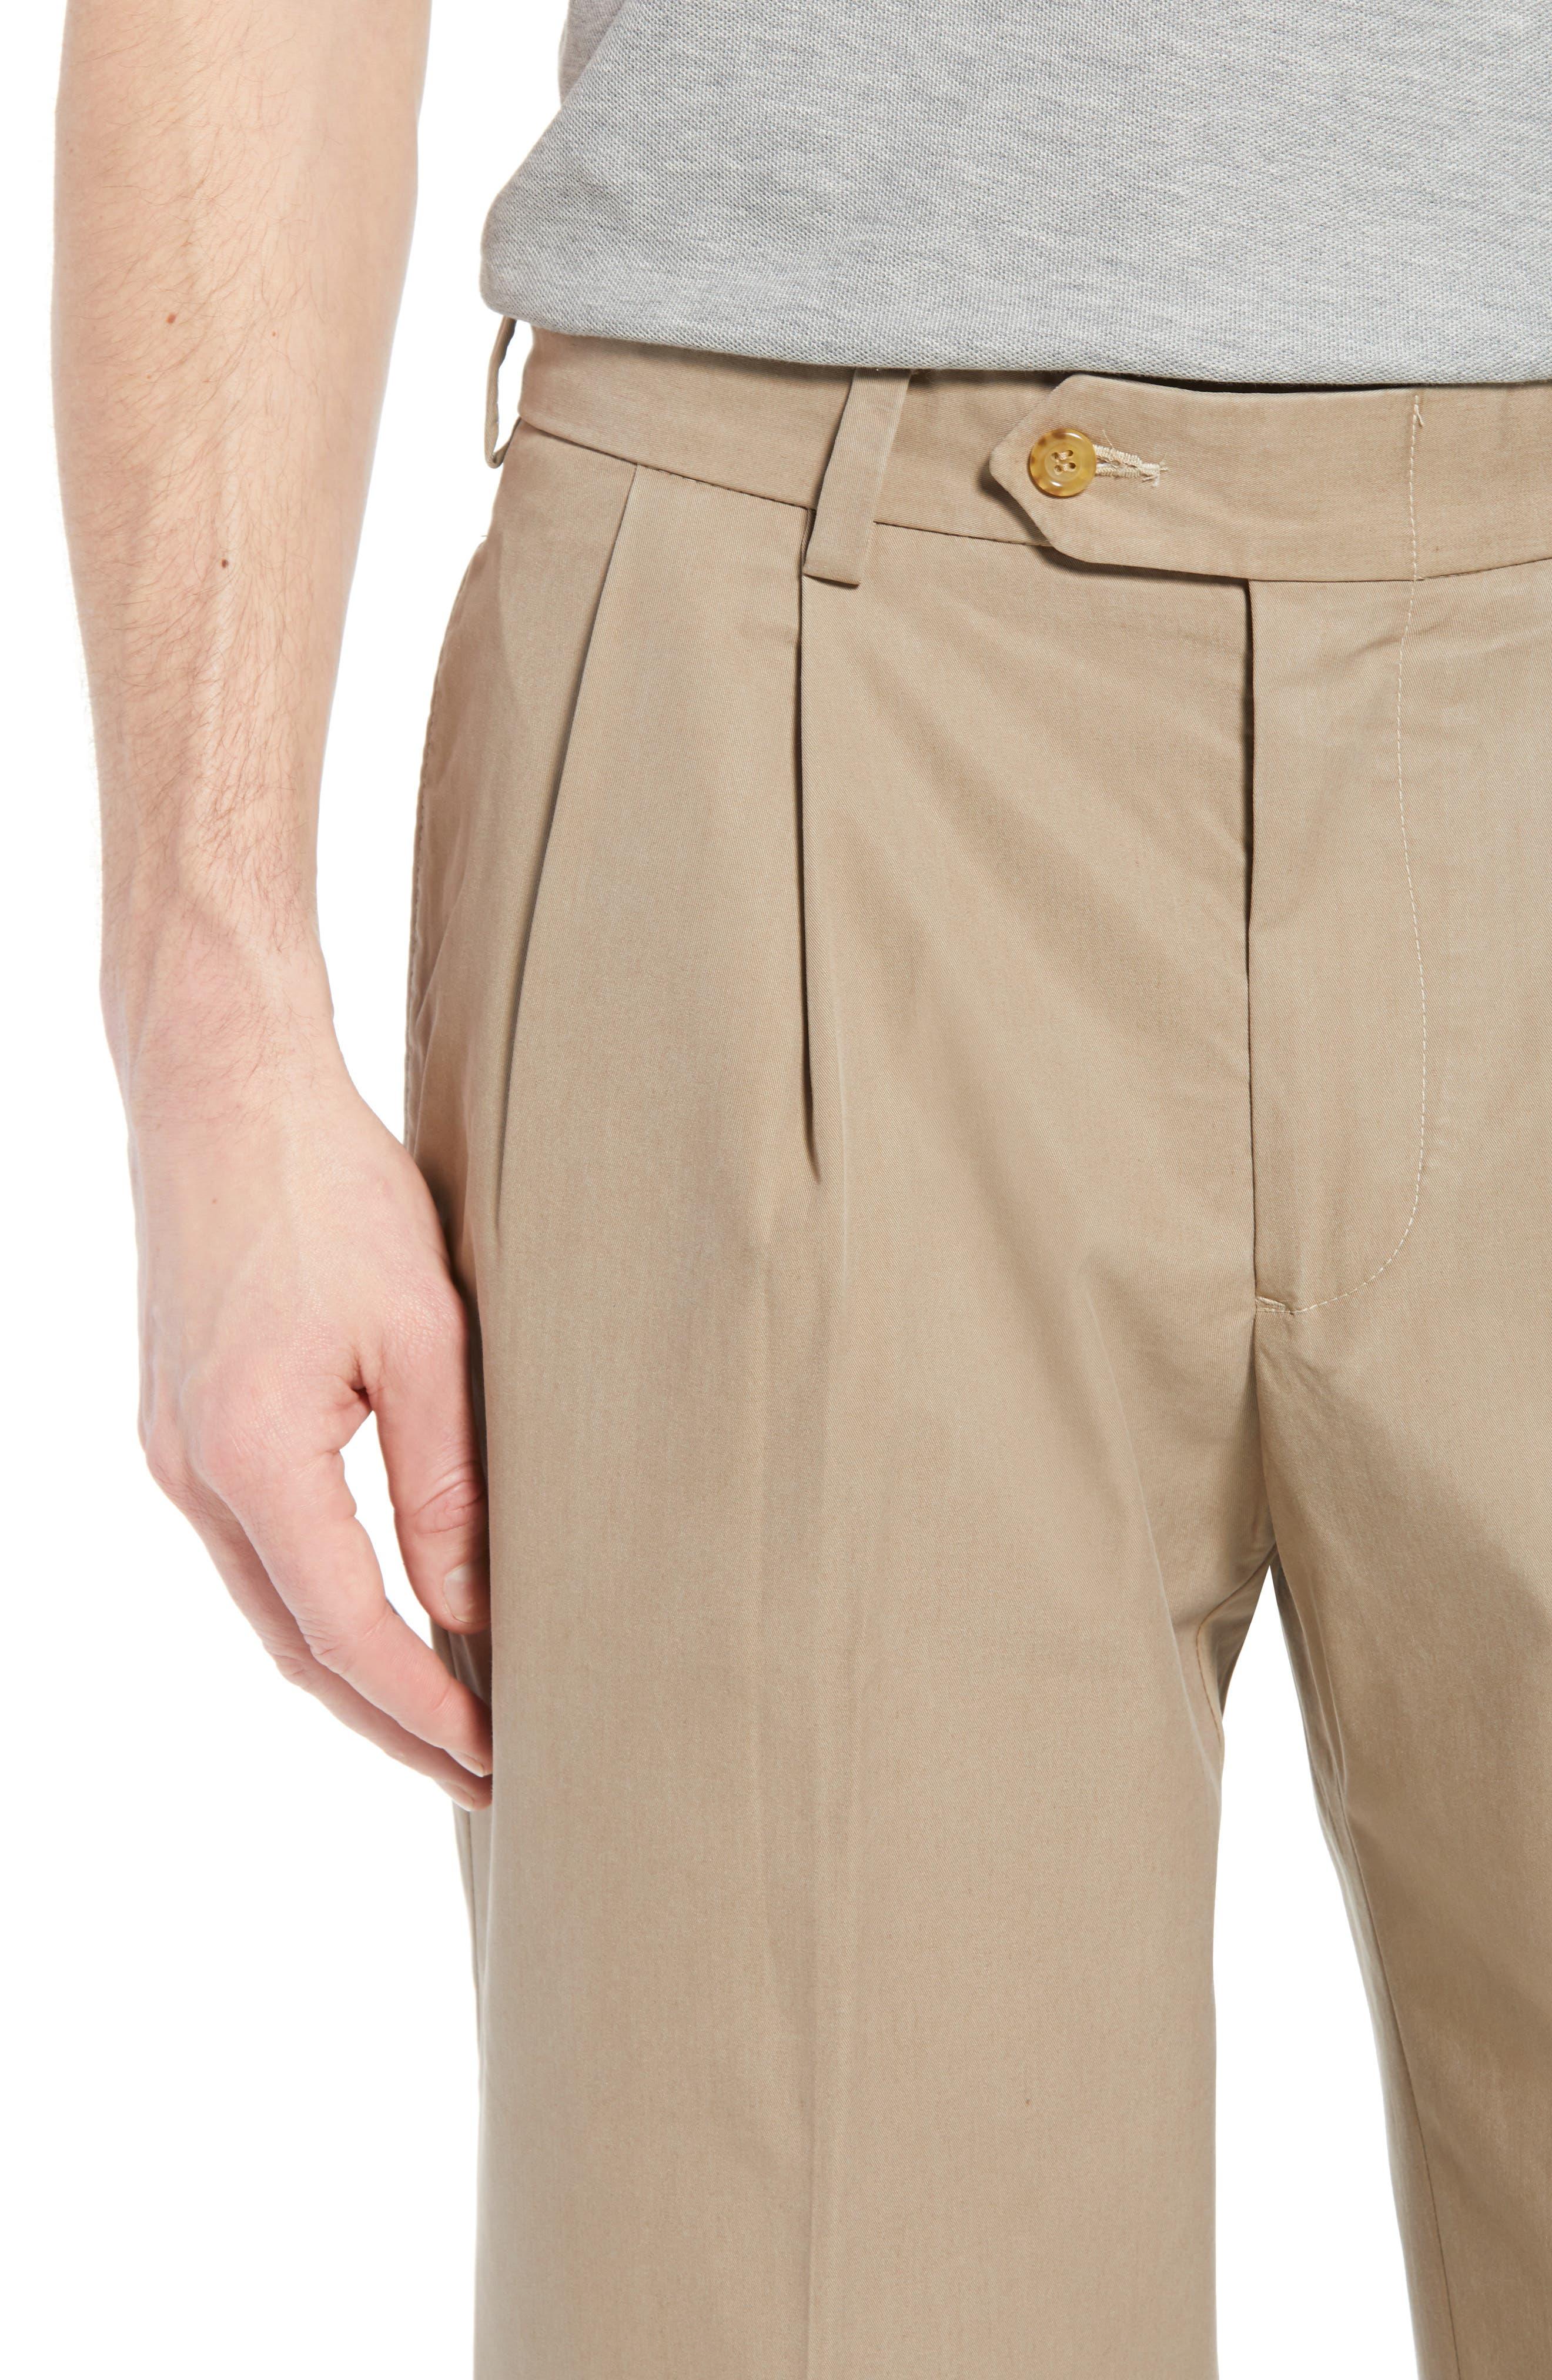 M2 Classic Fit Pleated Travel Twill Pants,                             Alternate thumbnail 4, color,                             KHAKI